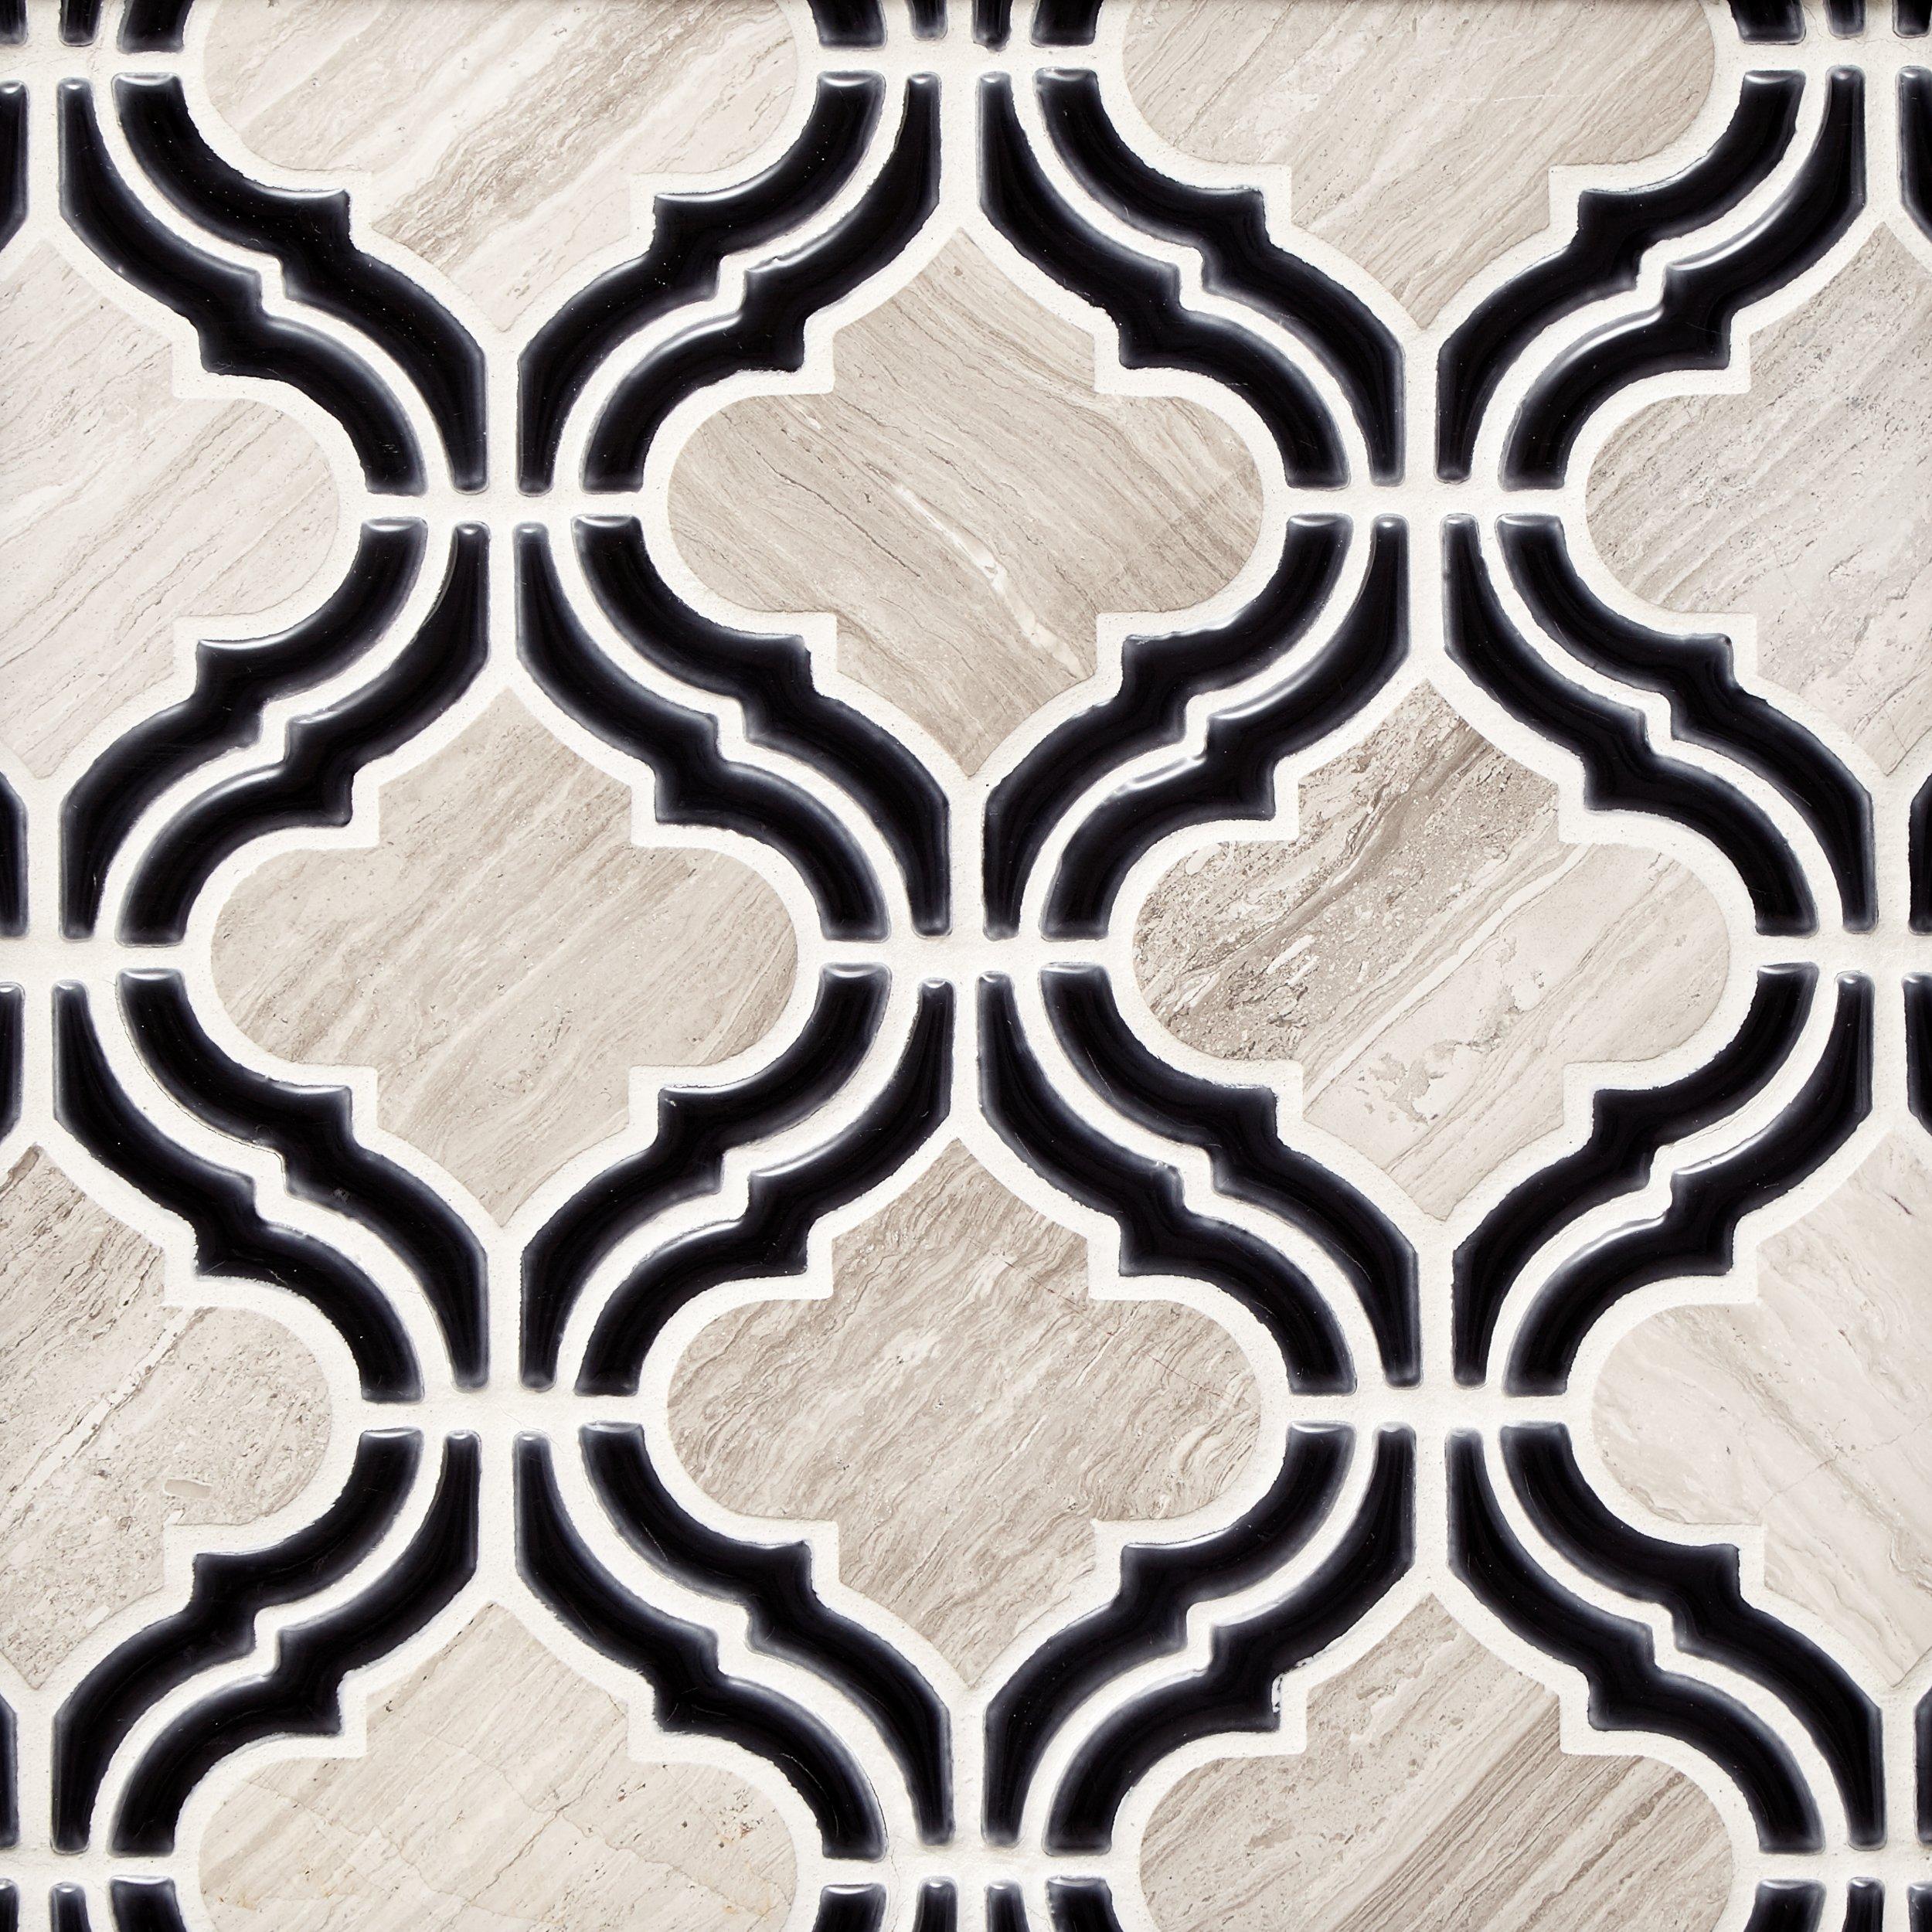 Mystic Valentino Arabesque Marble Mosaic - 11 x 10 - 100500289 | Floor and  Decor